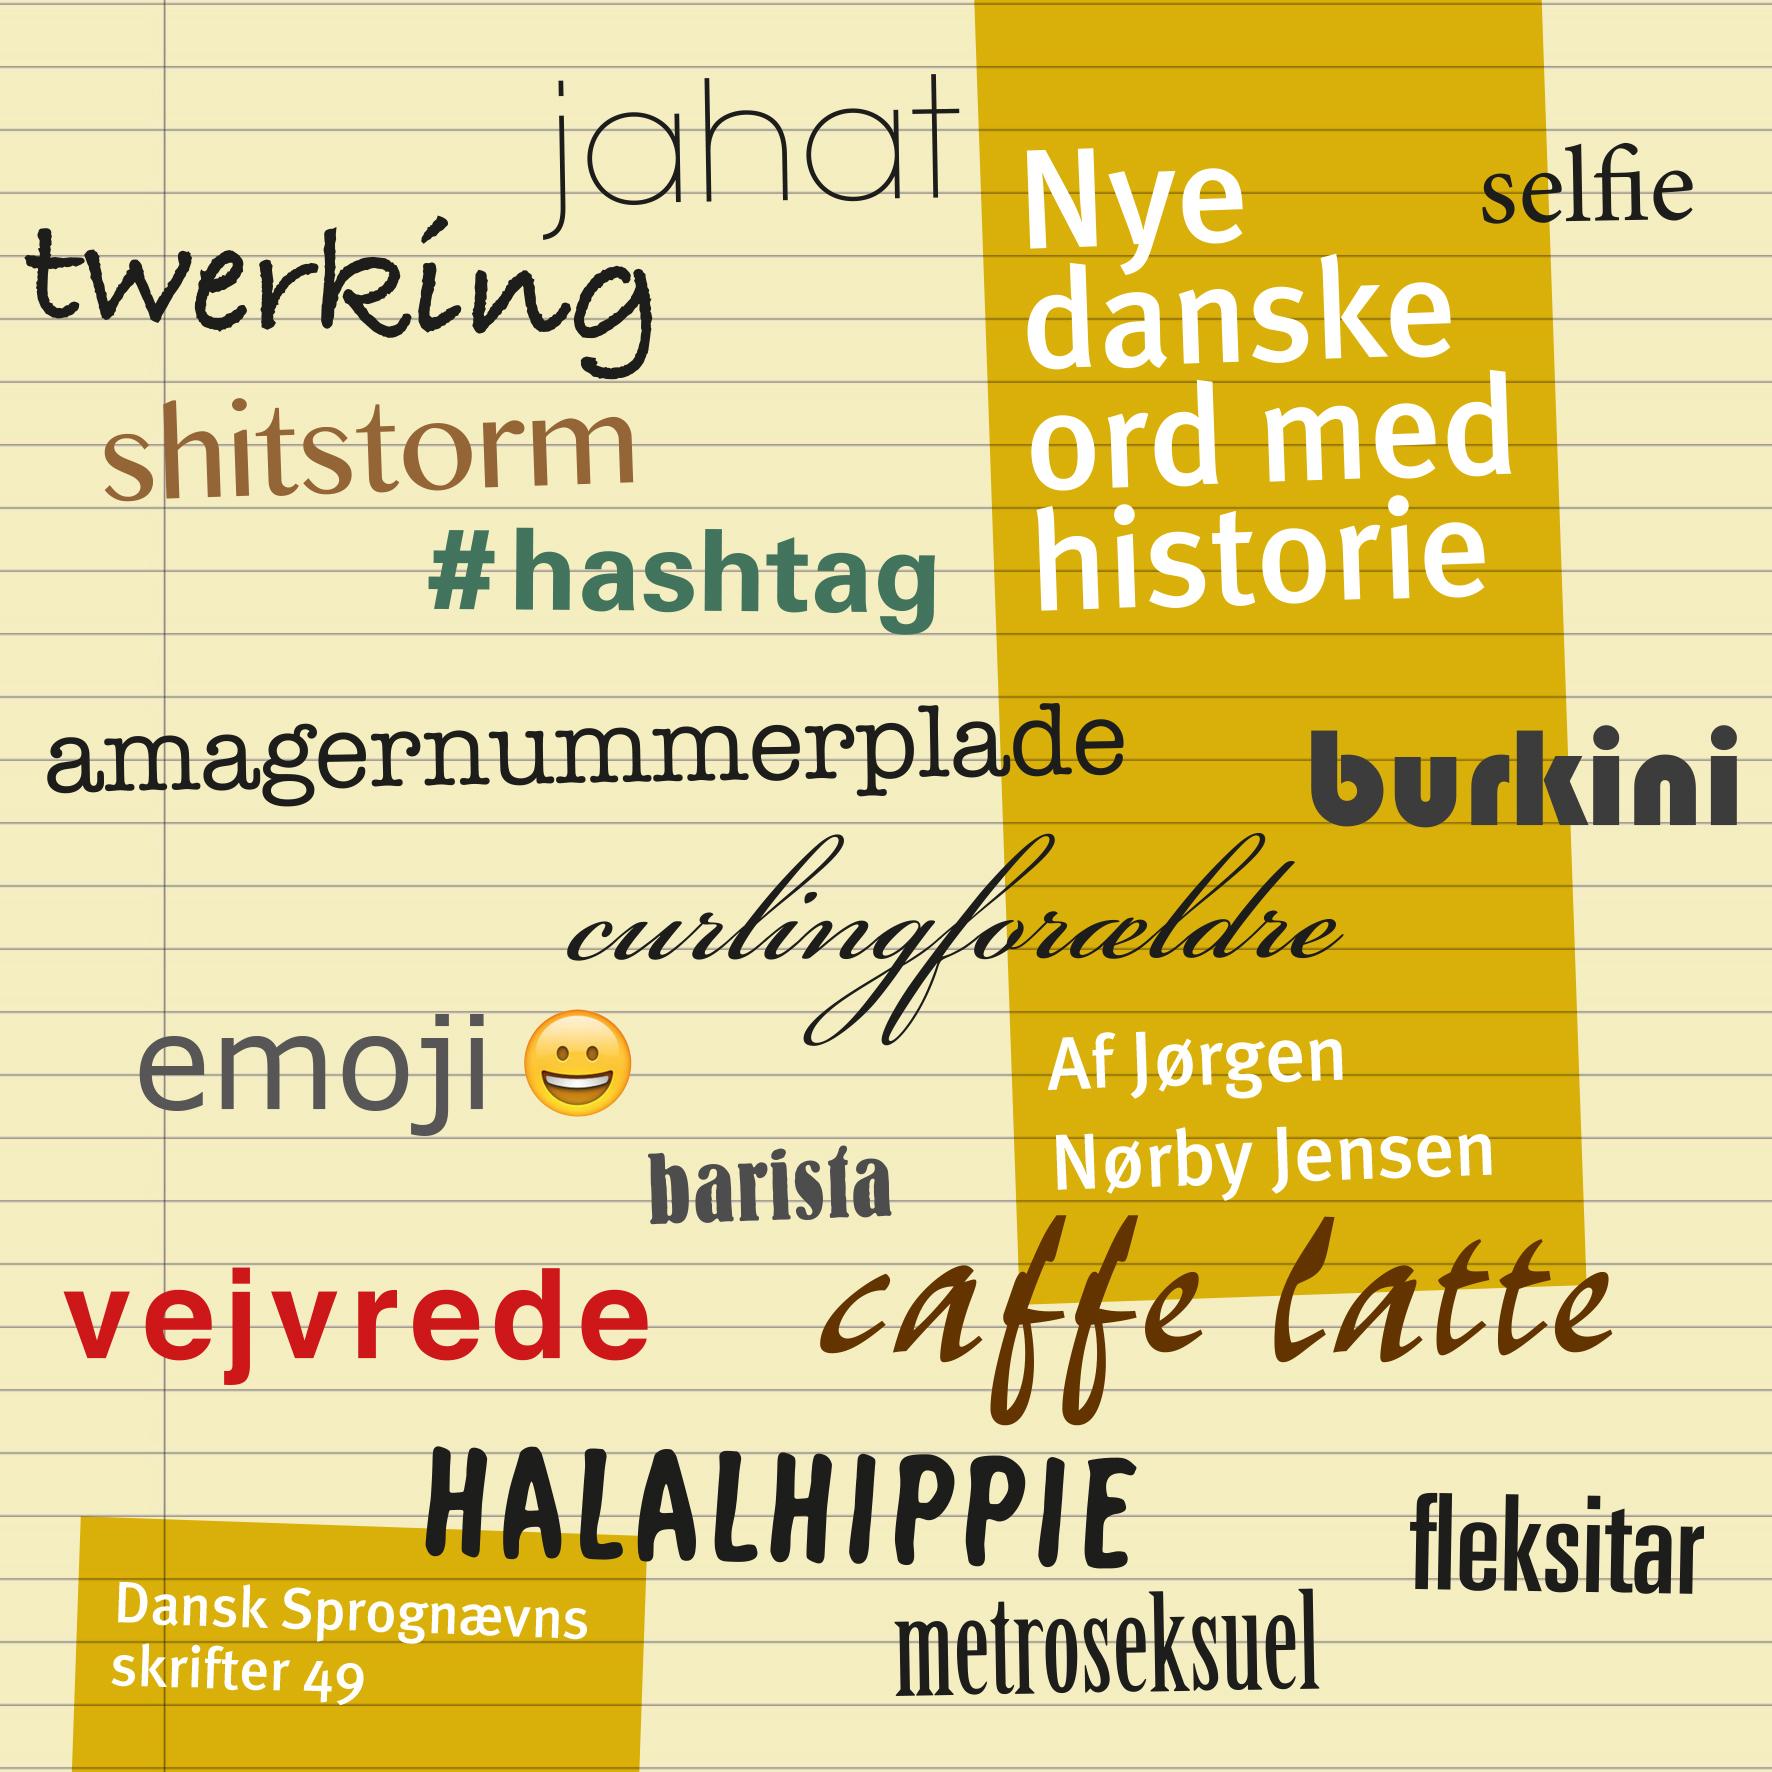 Nye danske ord med historie